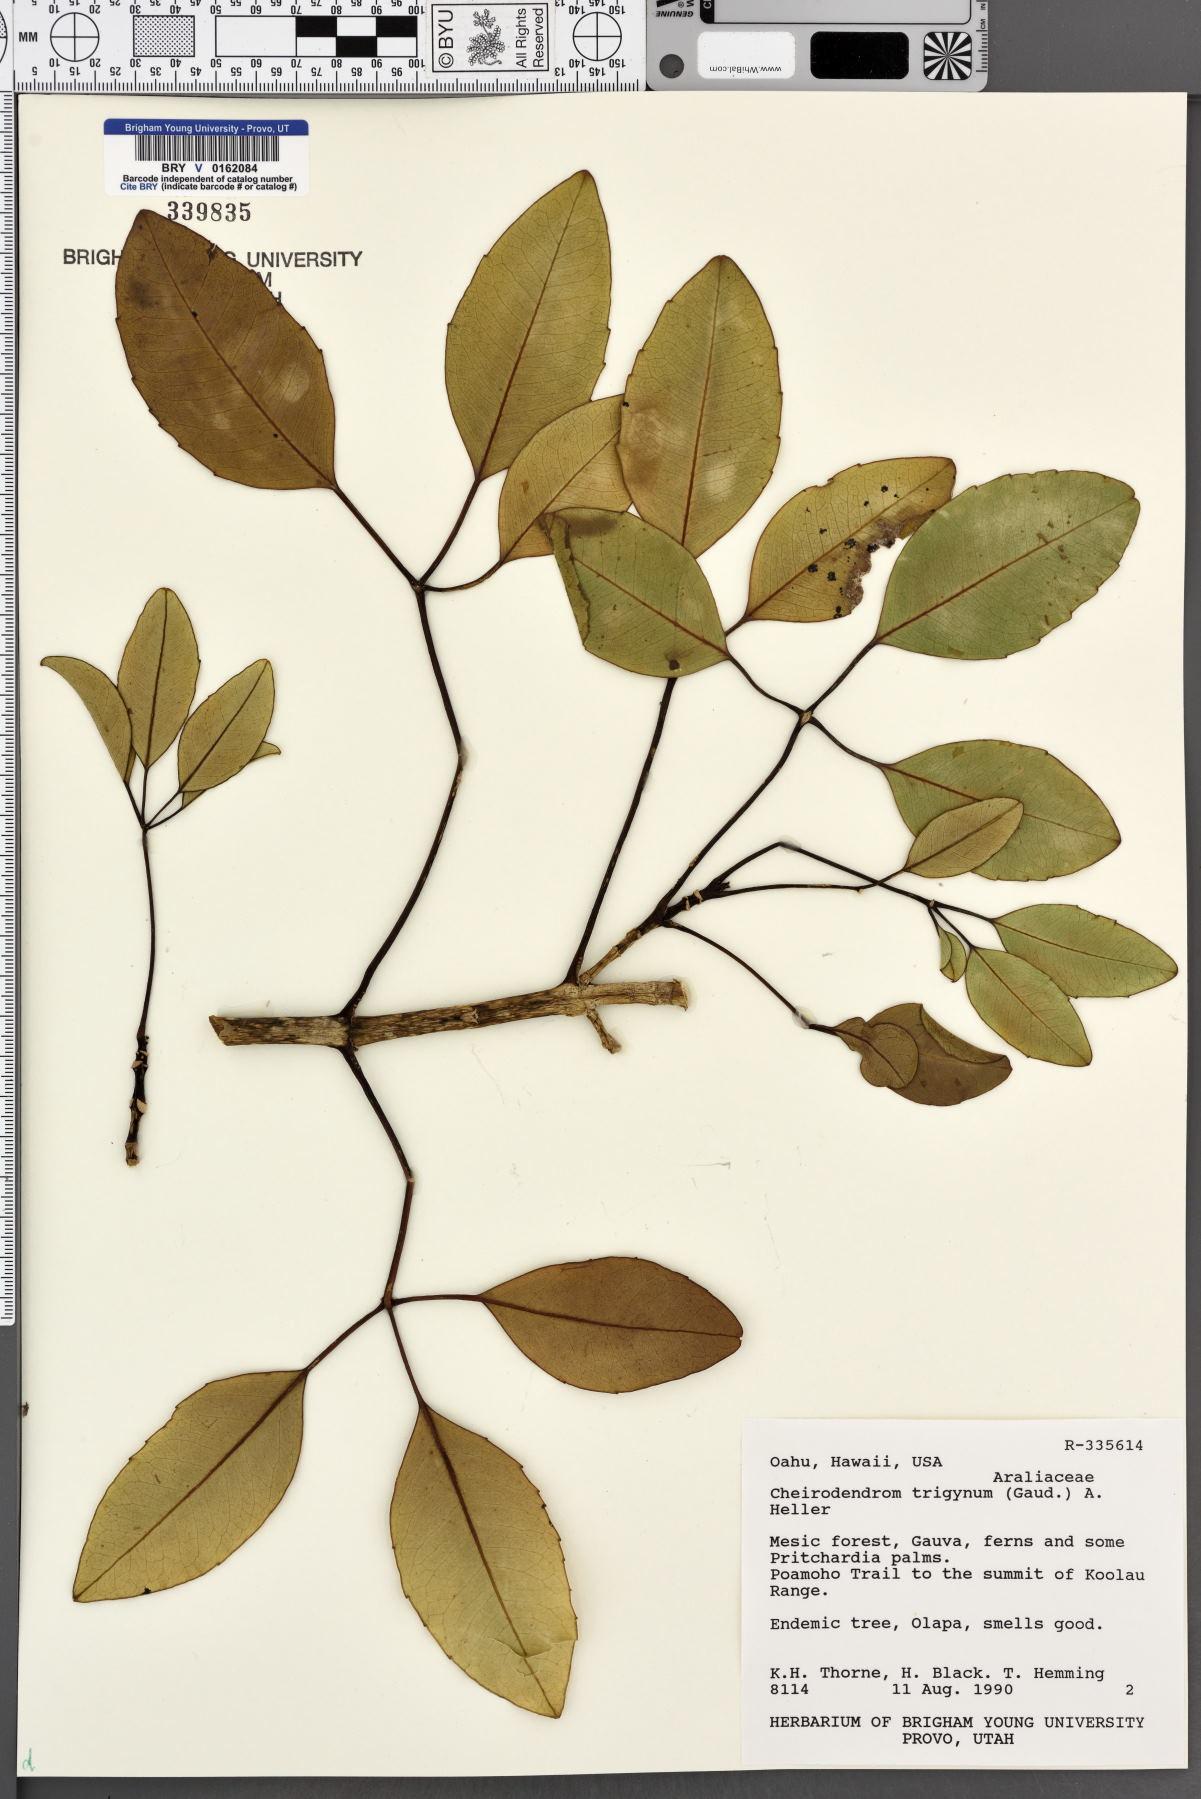 Cheirodendron image